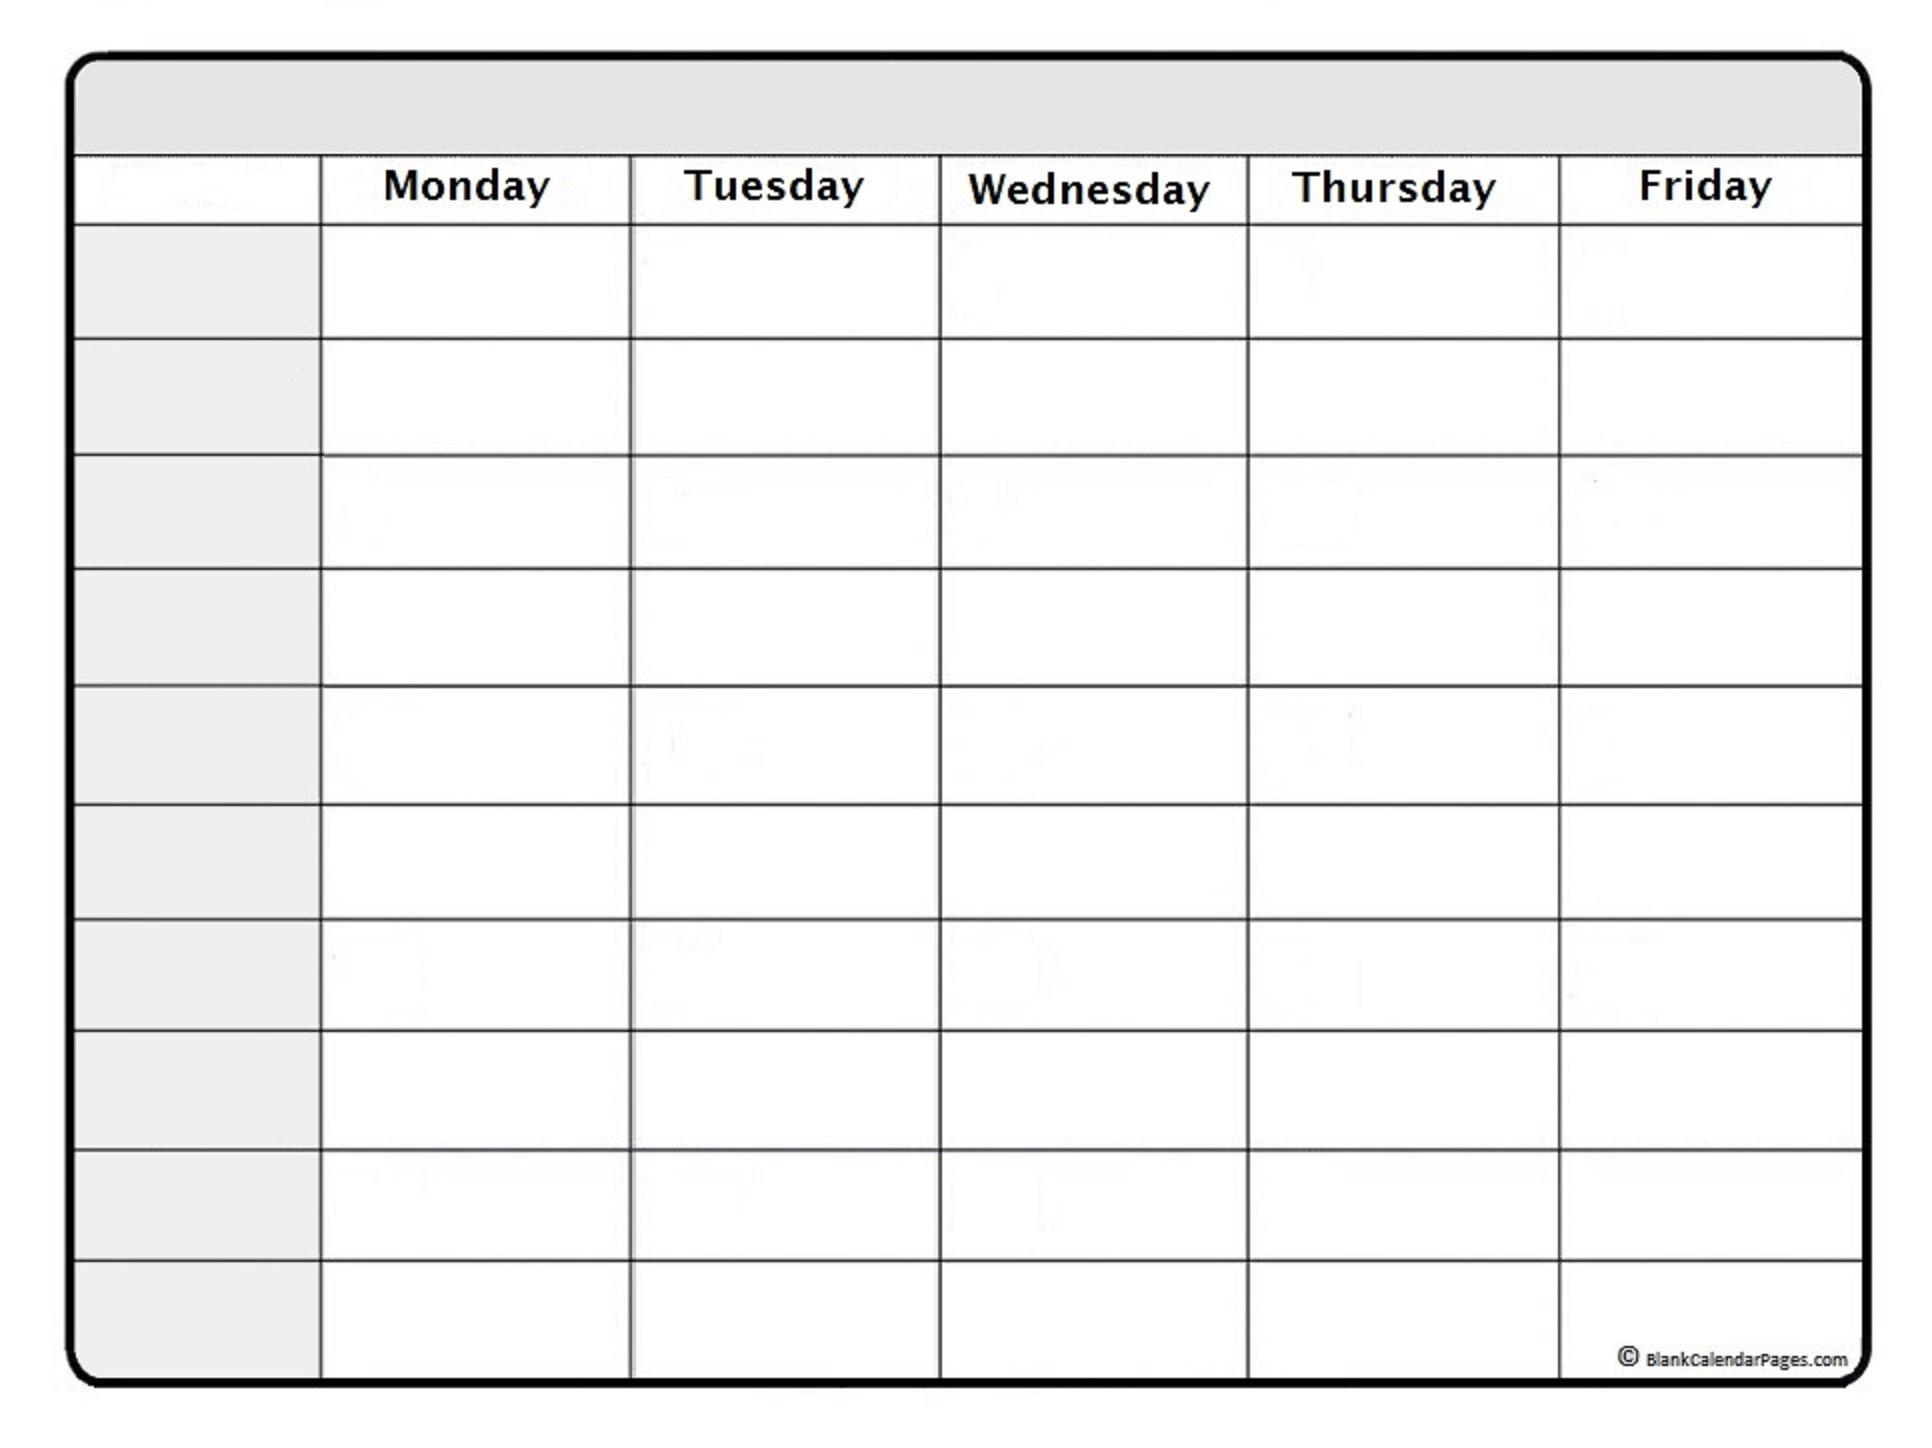 May 2020 Weekly Calendar | May 2020 Weekly Calendar Template  Blank Weekly Calendar